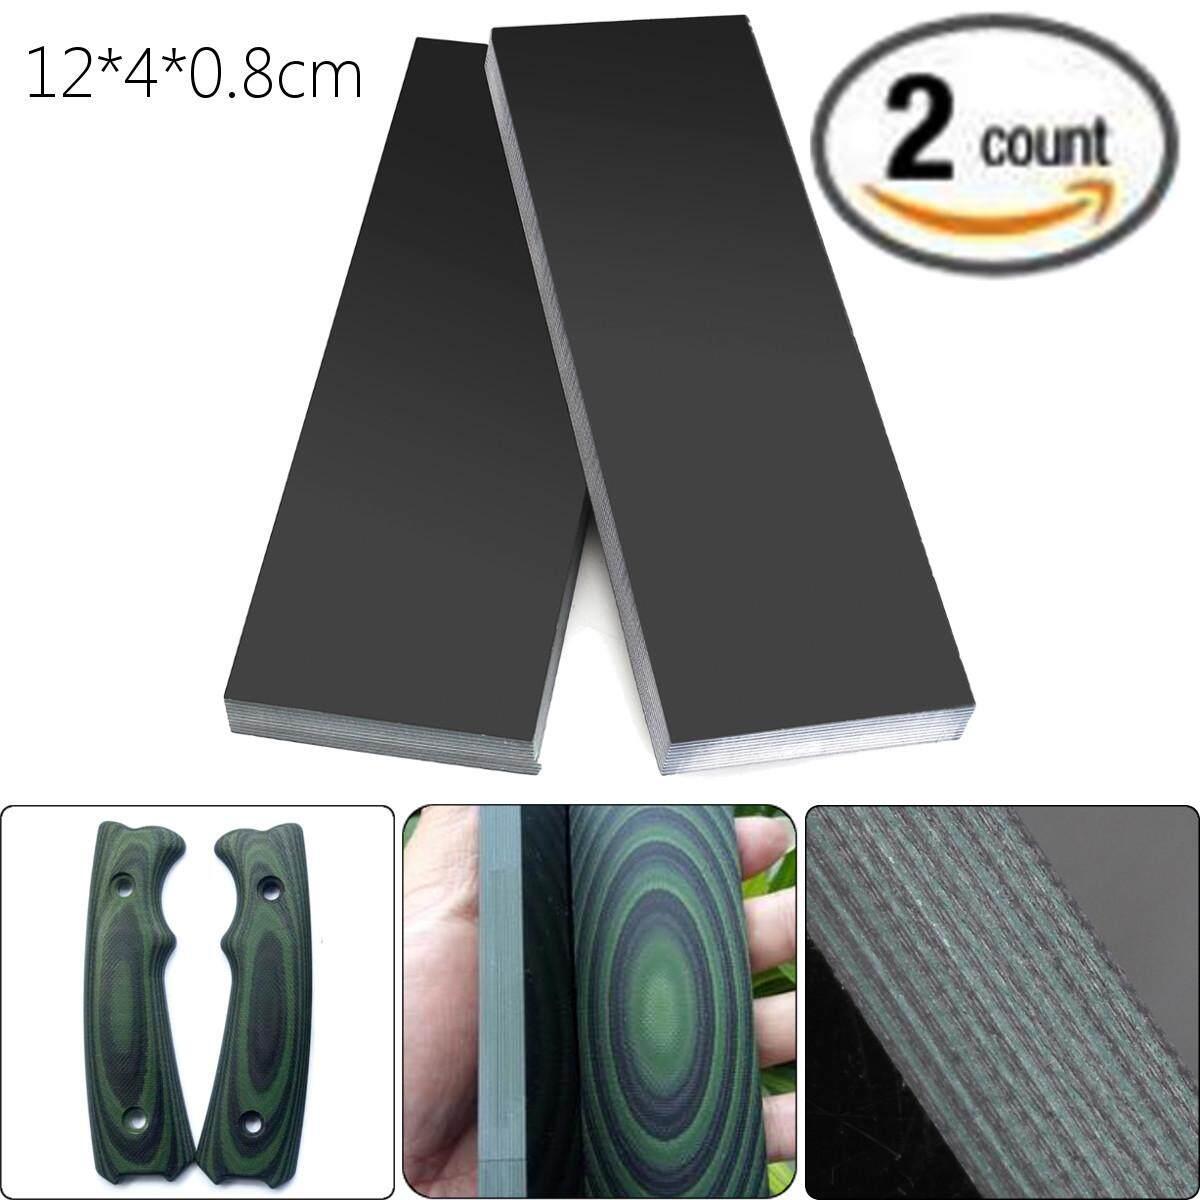 2Pcs 12x4x0.8cm G10 Blade Strip Handle Laminate Scales Slabs Multicolor Engraved